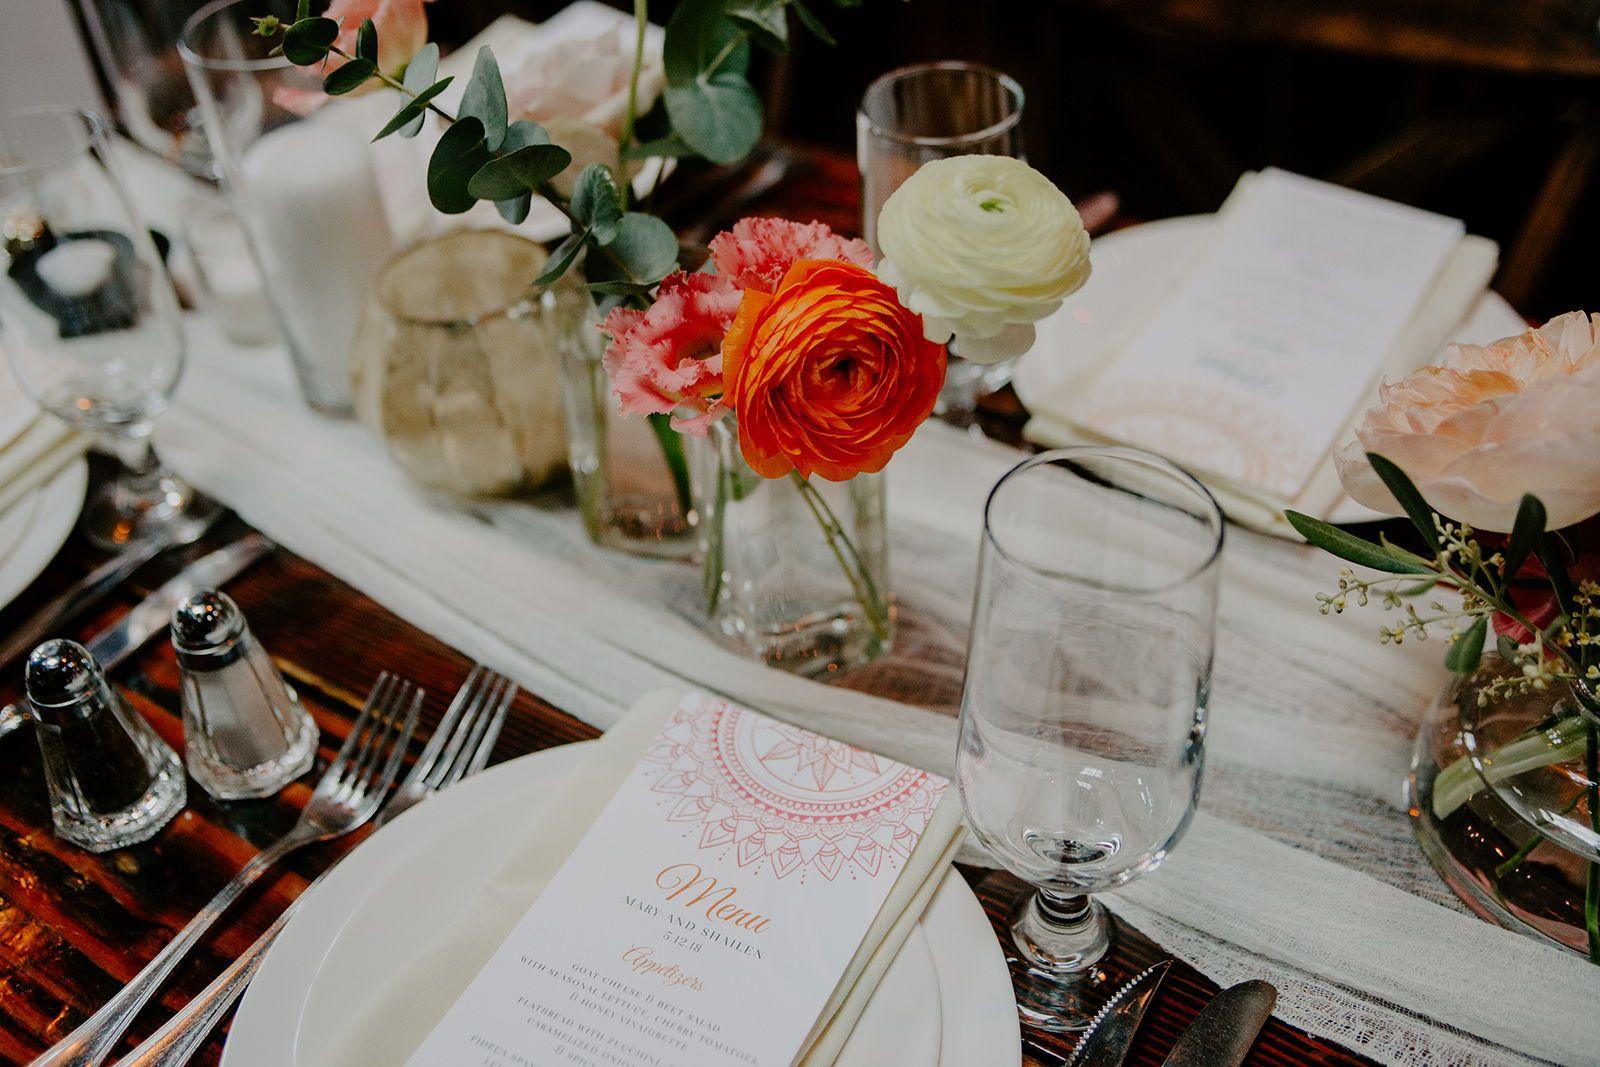 Henna dinner menu from Mary + Shay's Indian Wedding